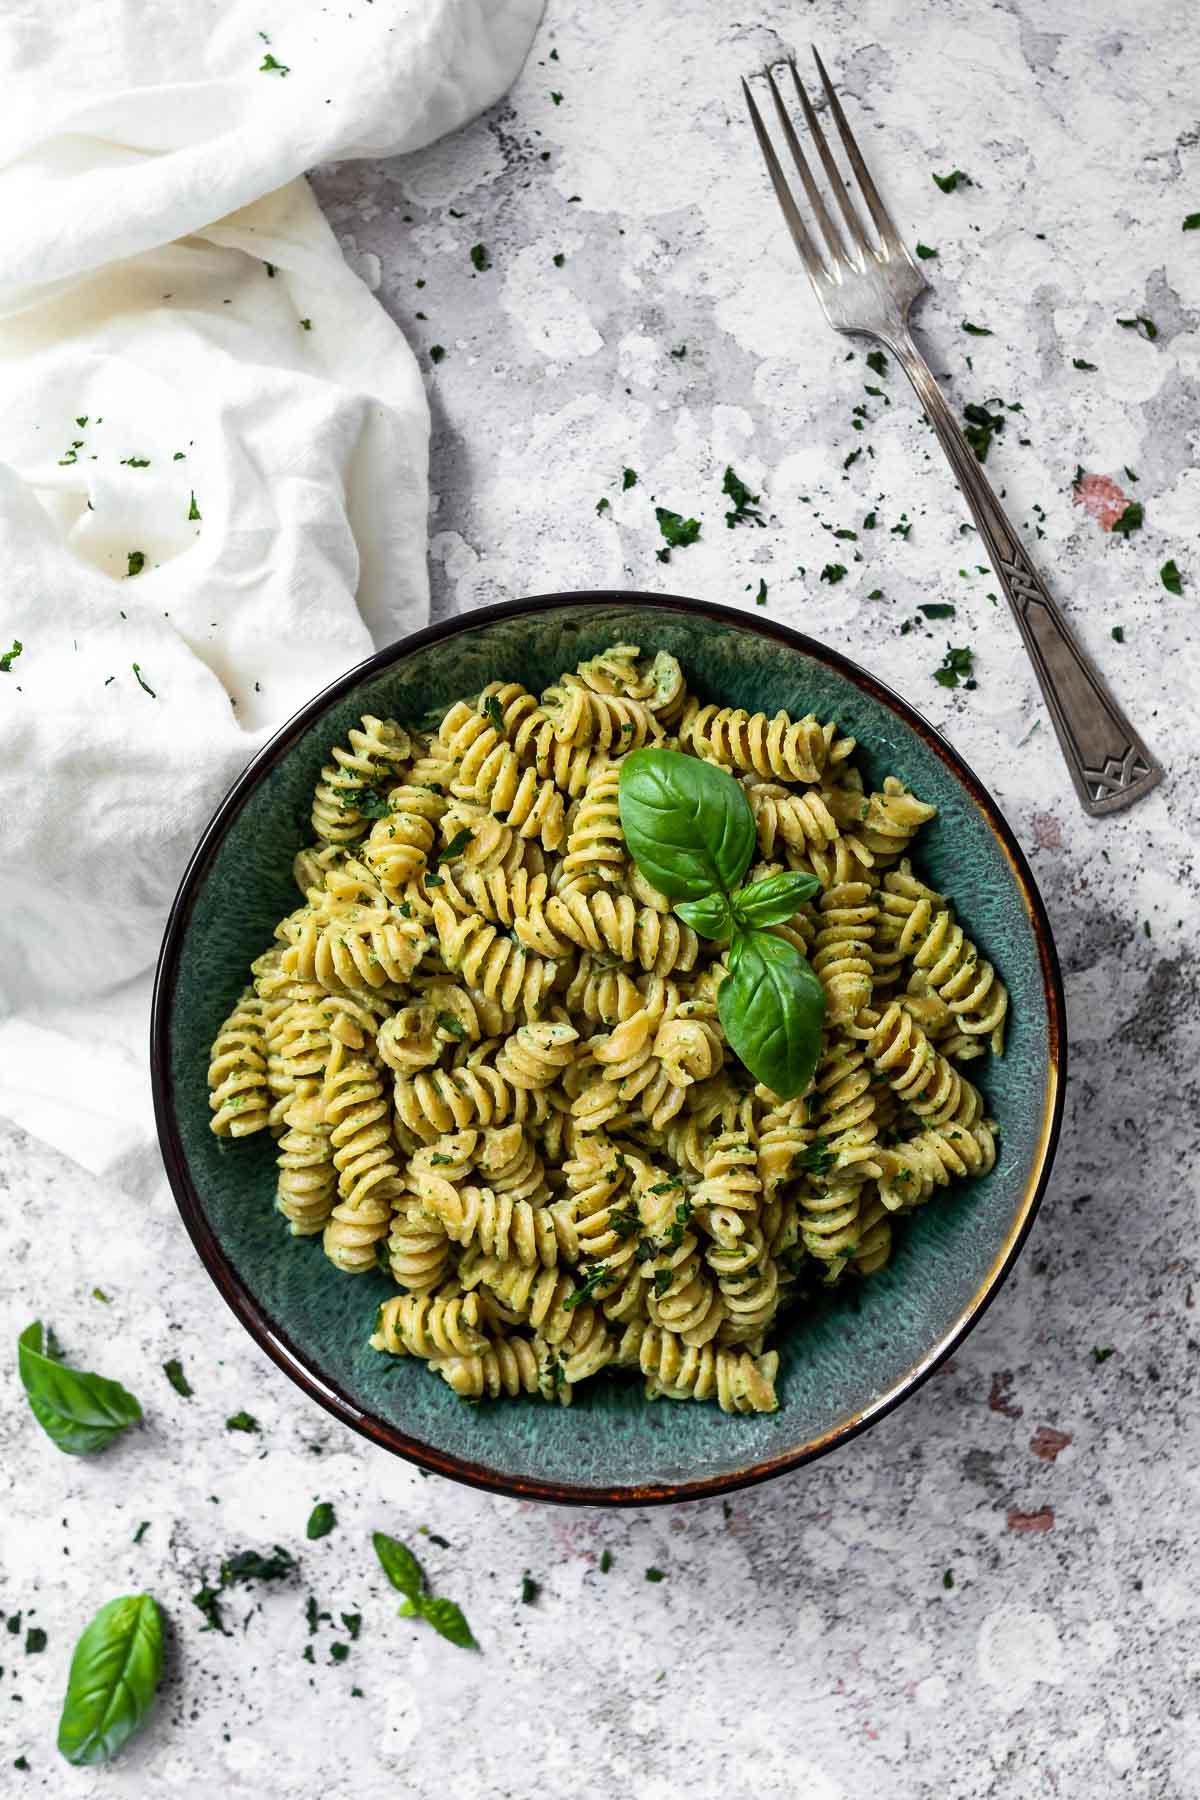 Bowl with vegan pasta dressed in a vegan basil cream sauce.